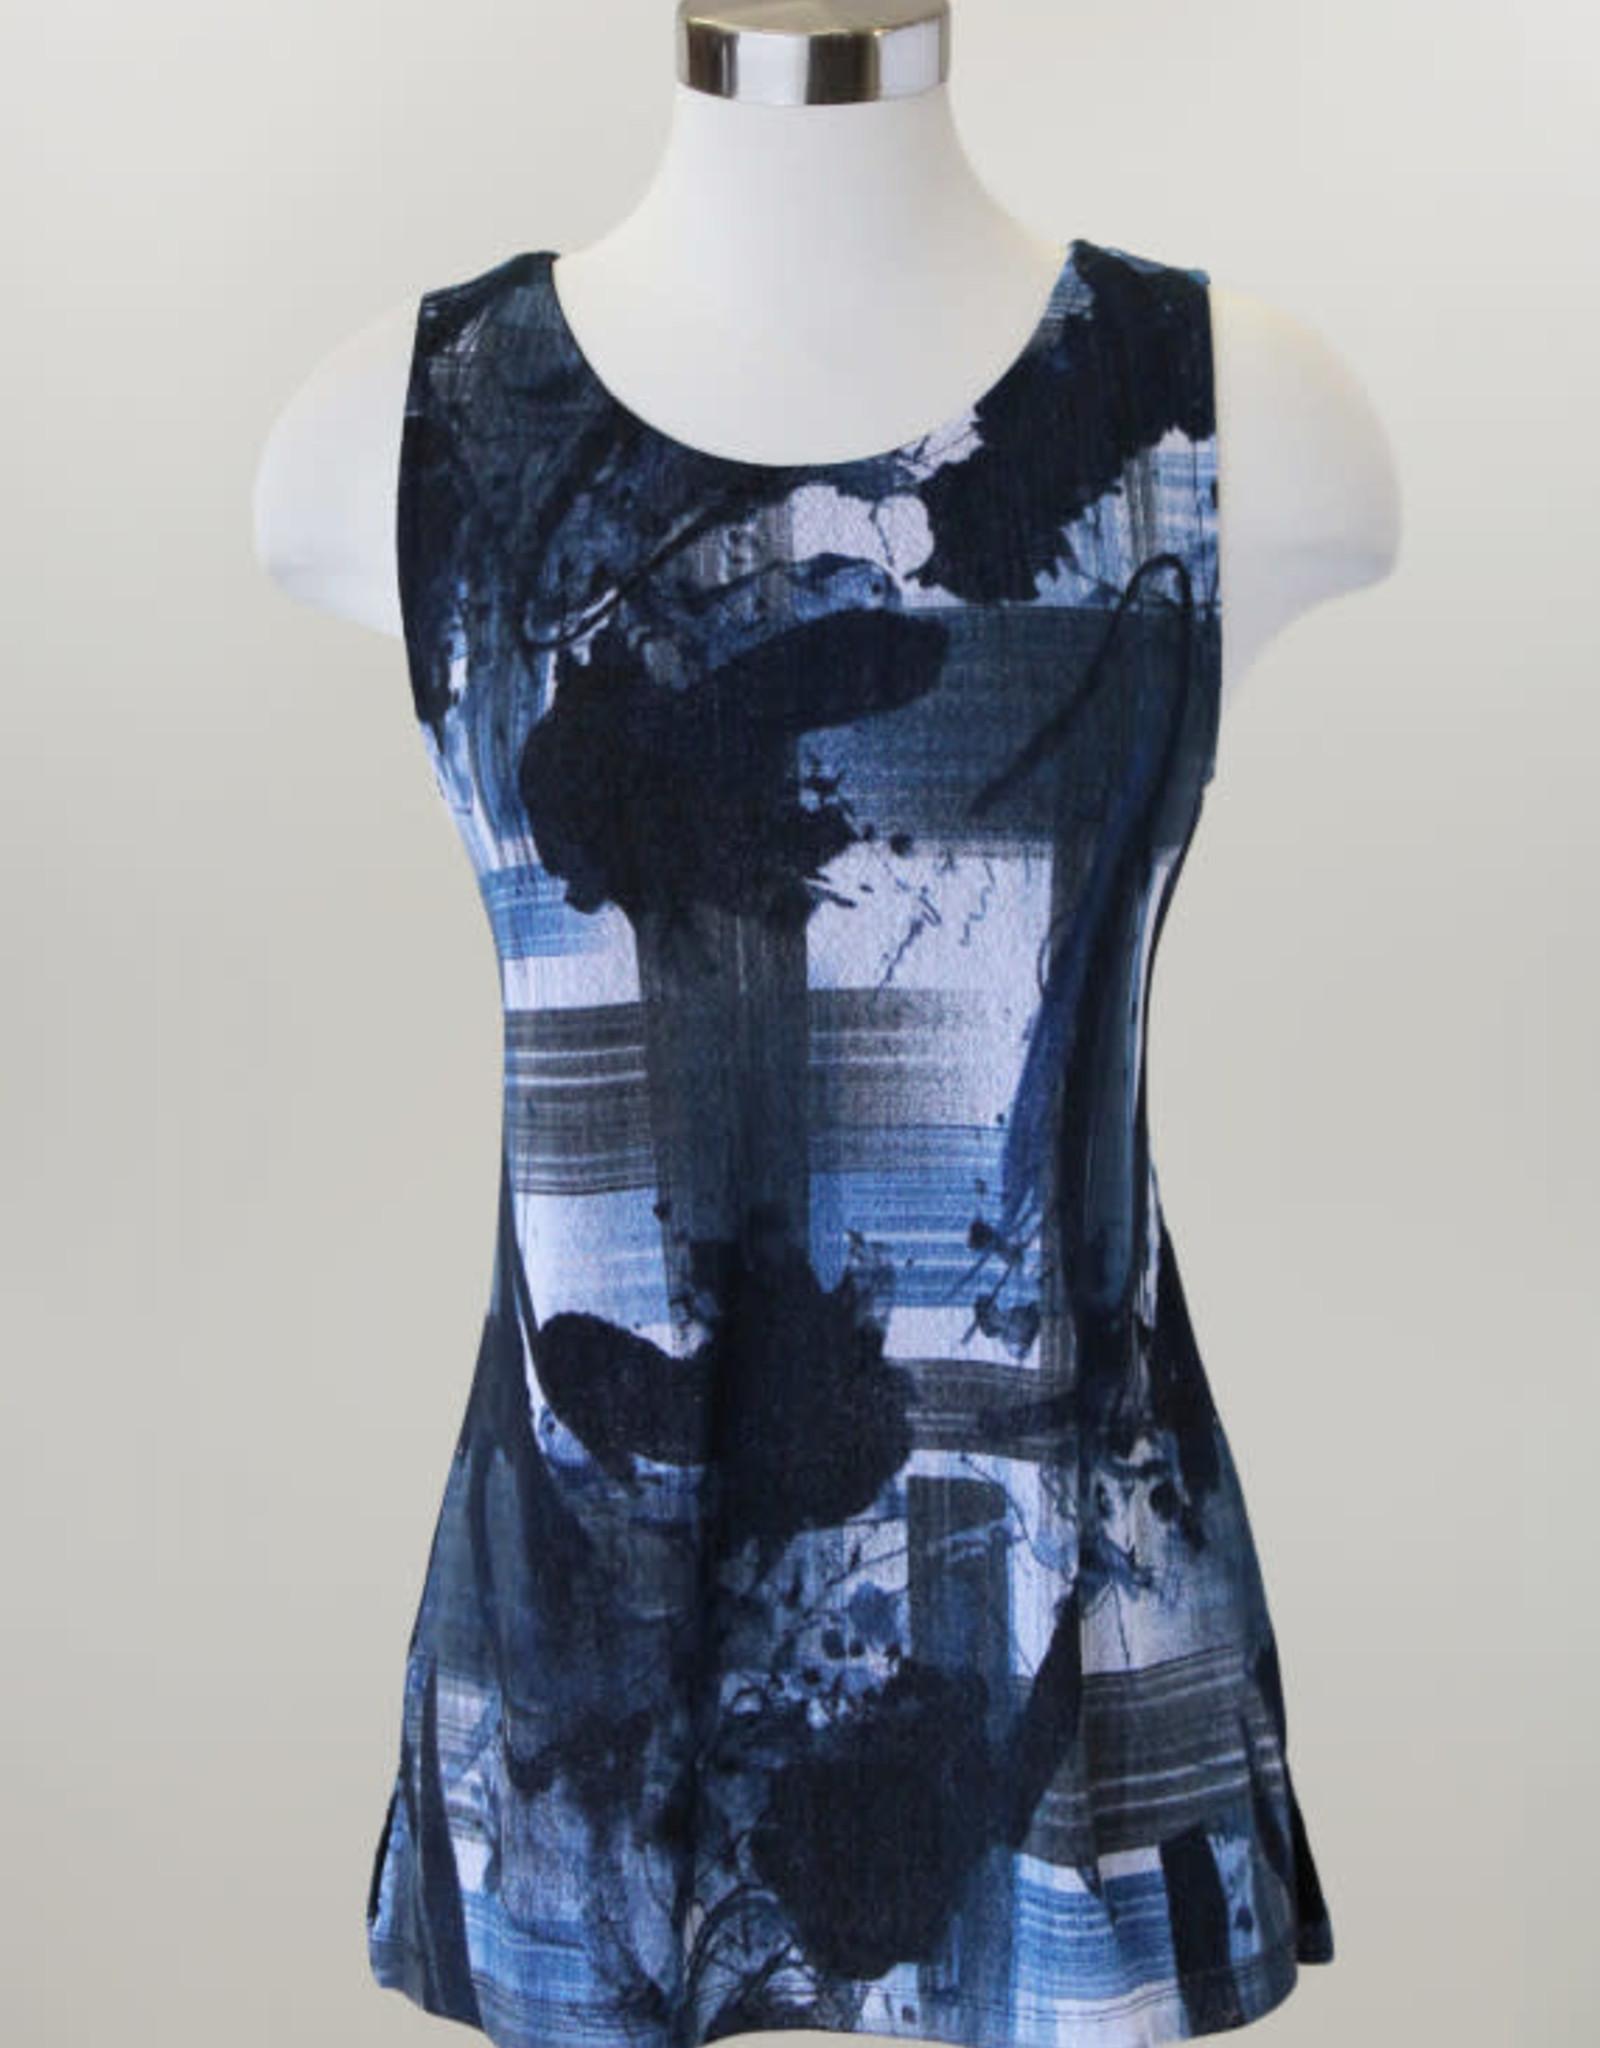 - Black/Blue/White Print Mesh Tank